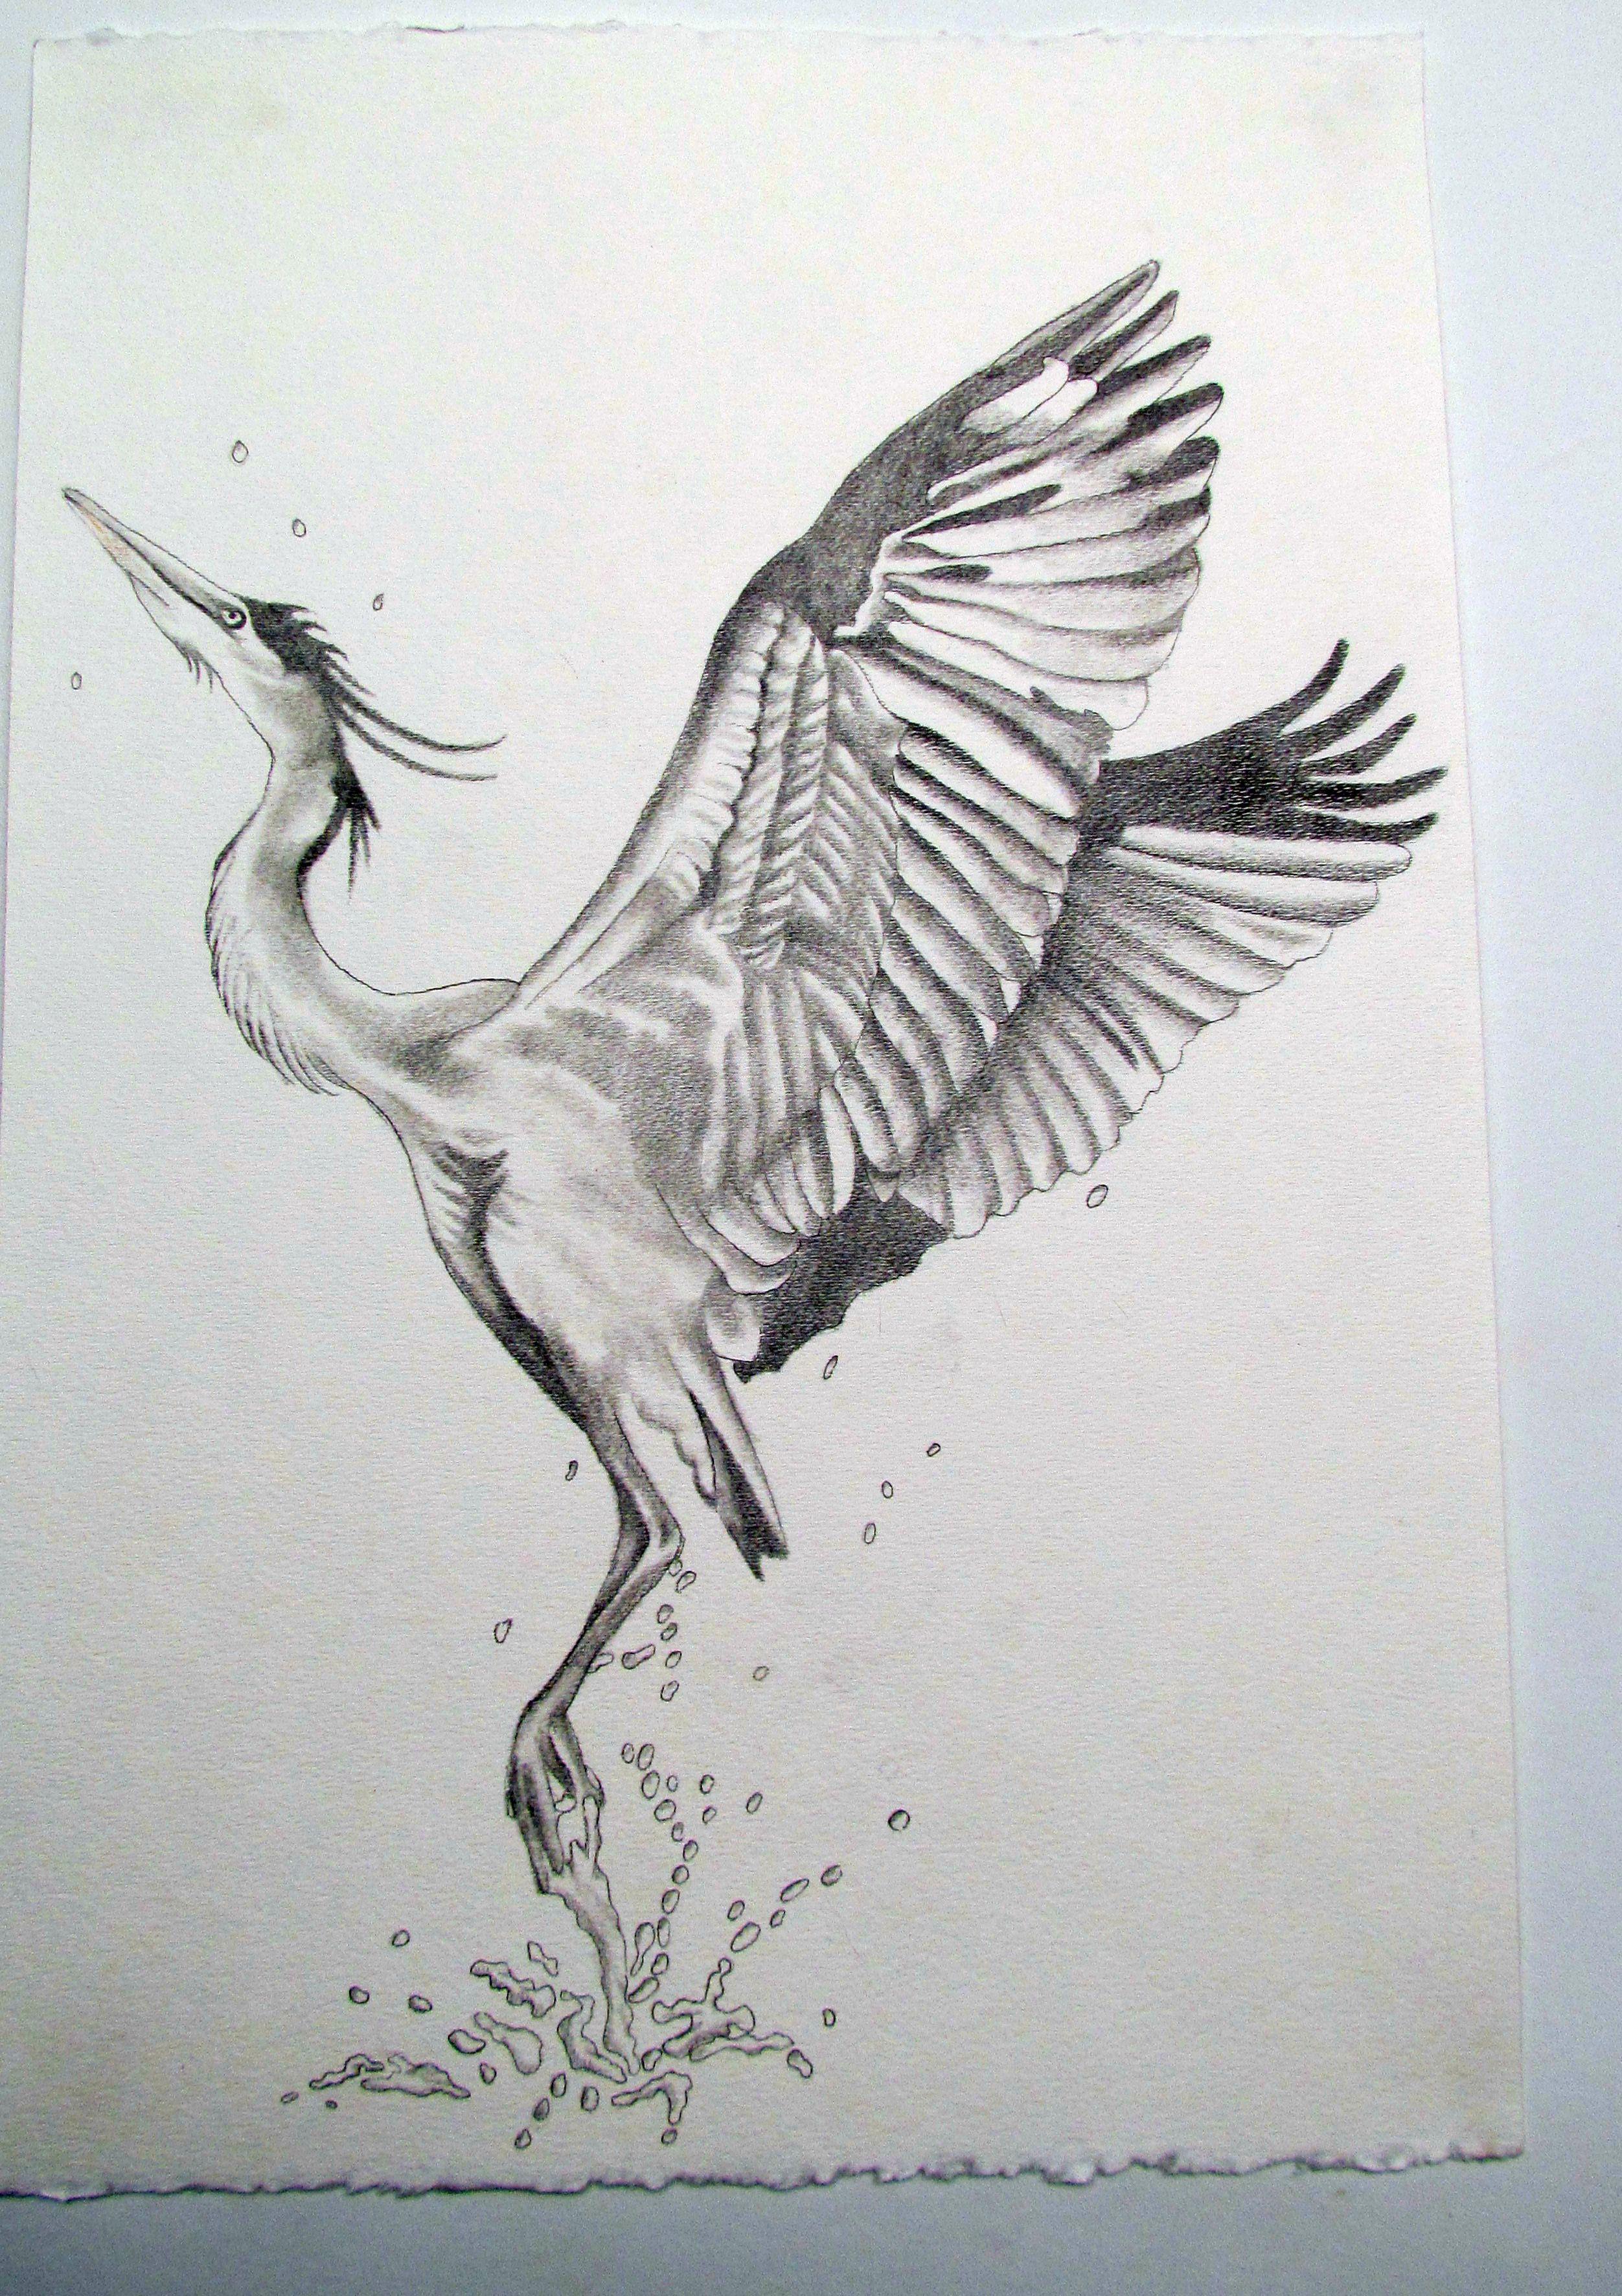 blue heron tattoo sketch tattoo future pinterest heron tattoo blue heron and sketches. Black Bedroom Furniture Sets. Home Design Ideas